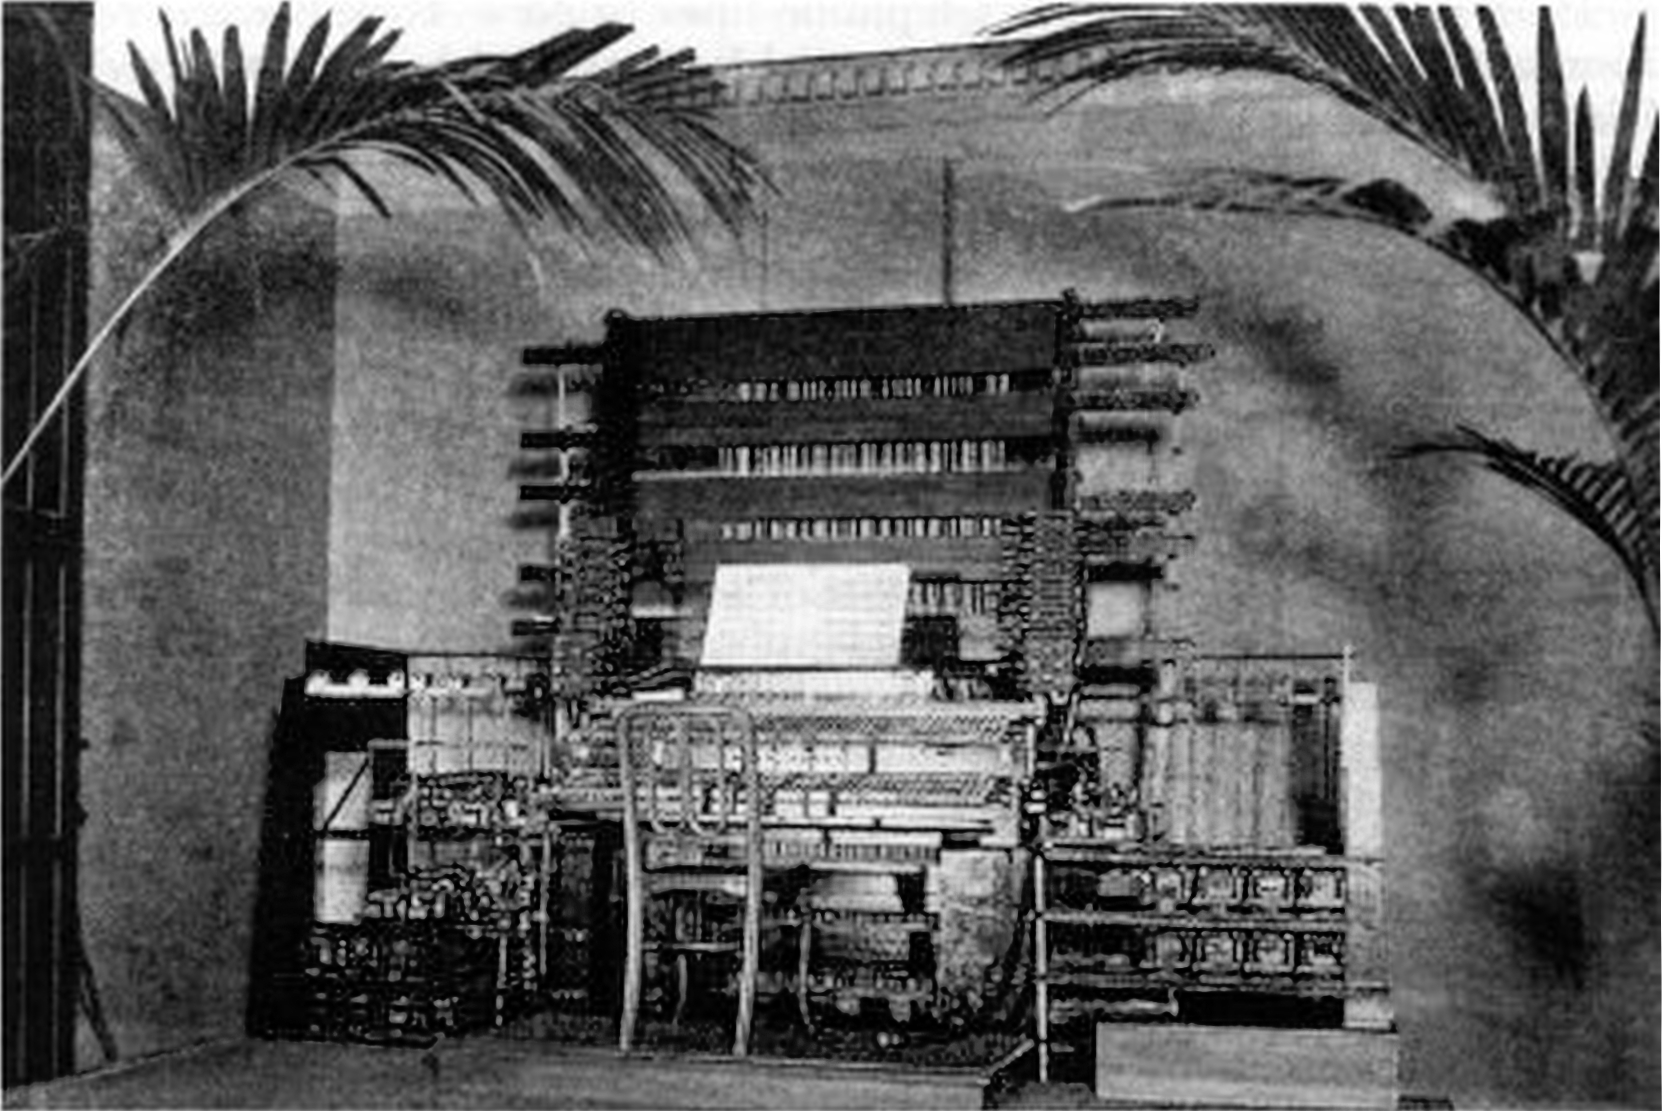 File:Telharmonium console (1897) (zoomed 400%, sharper).jpg - Wikimedia  Commons